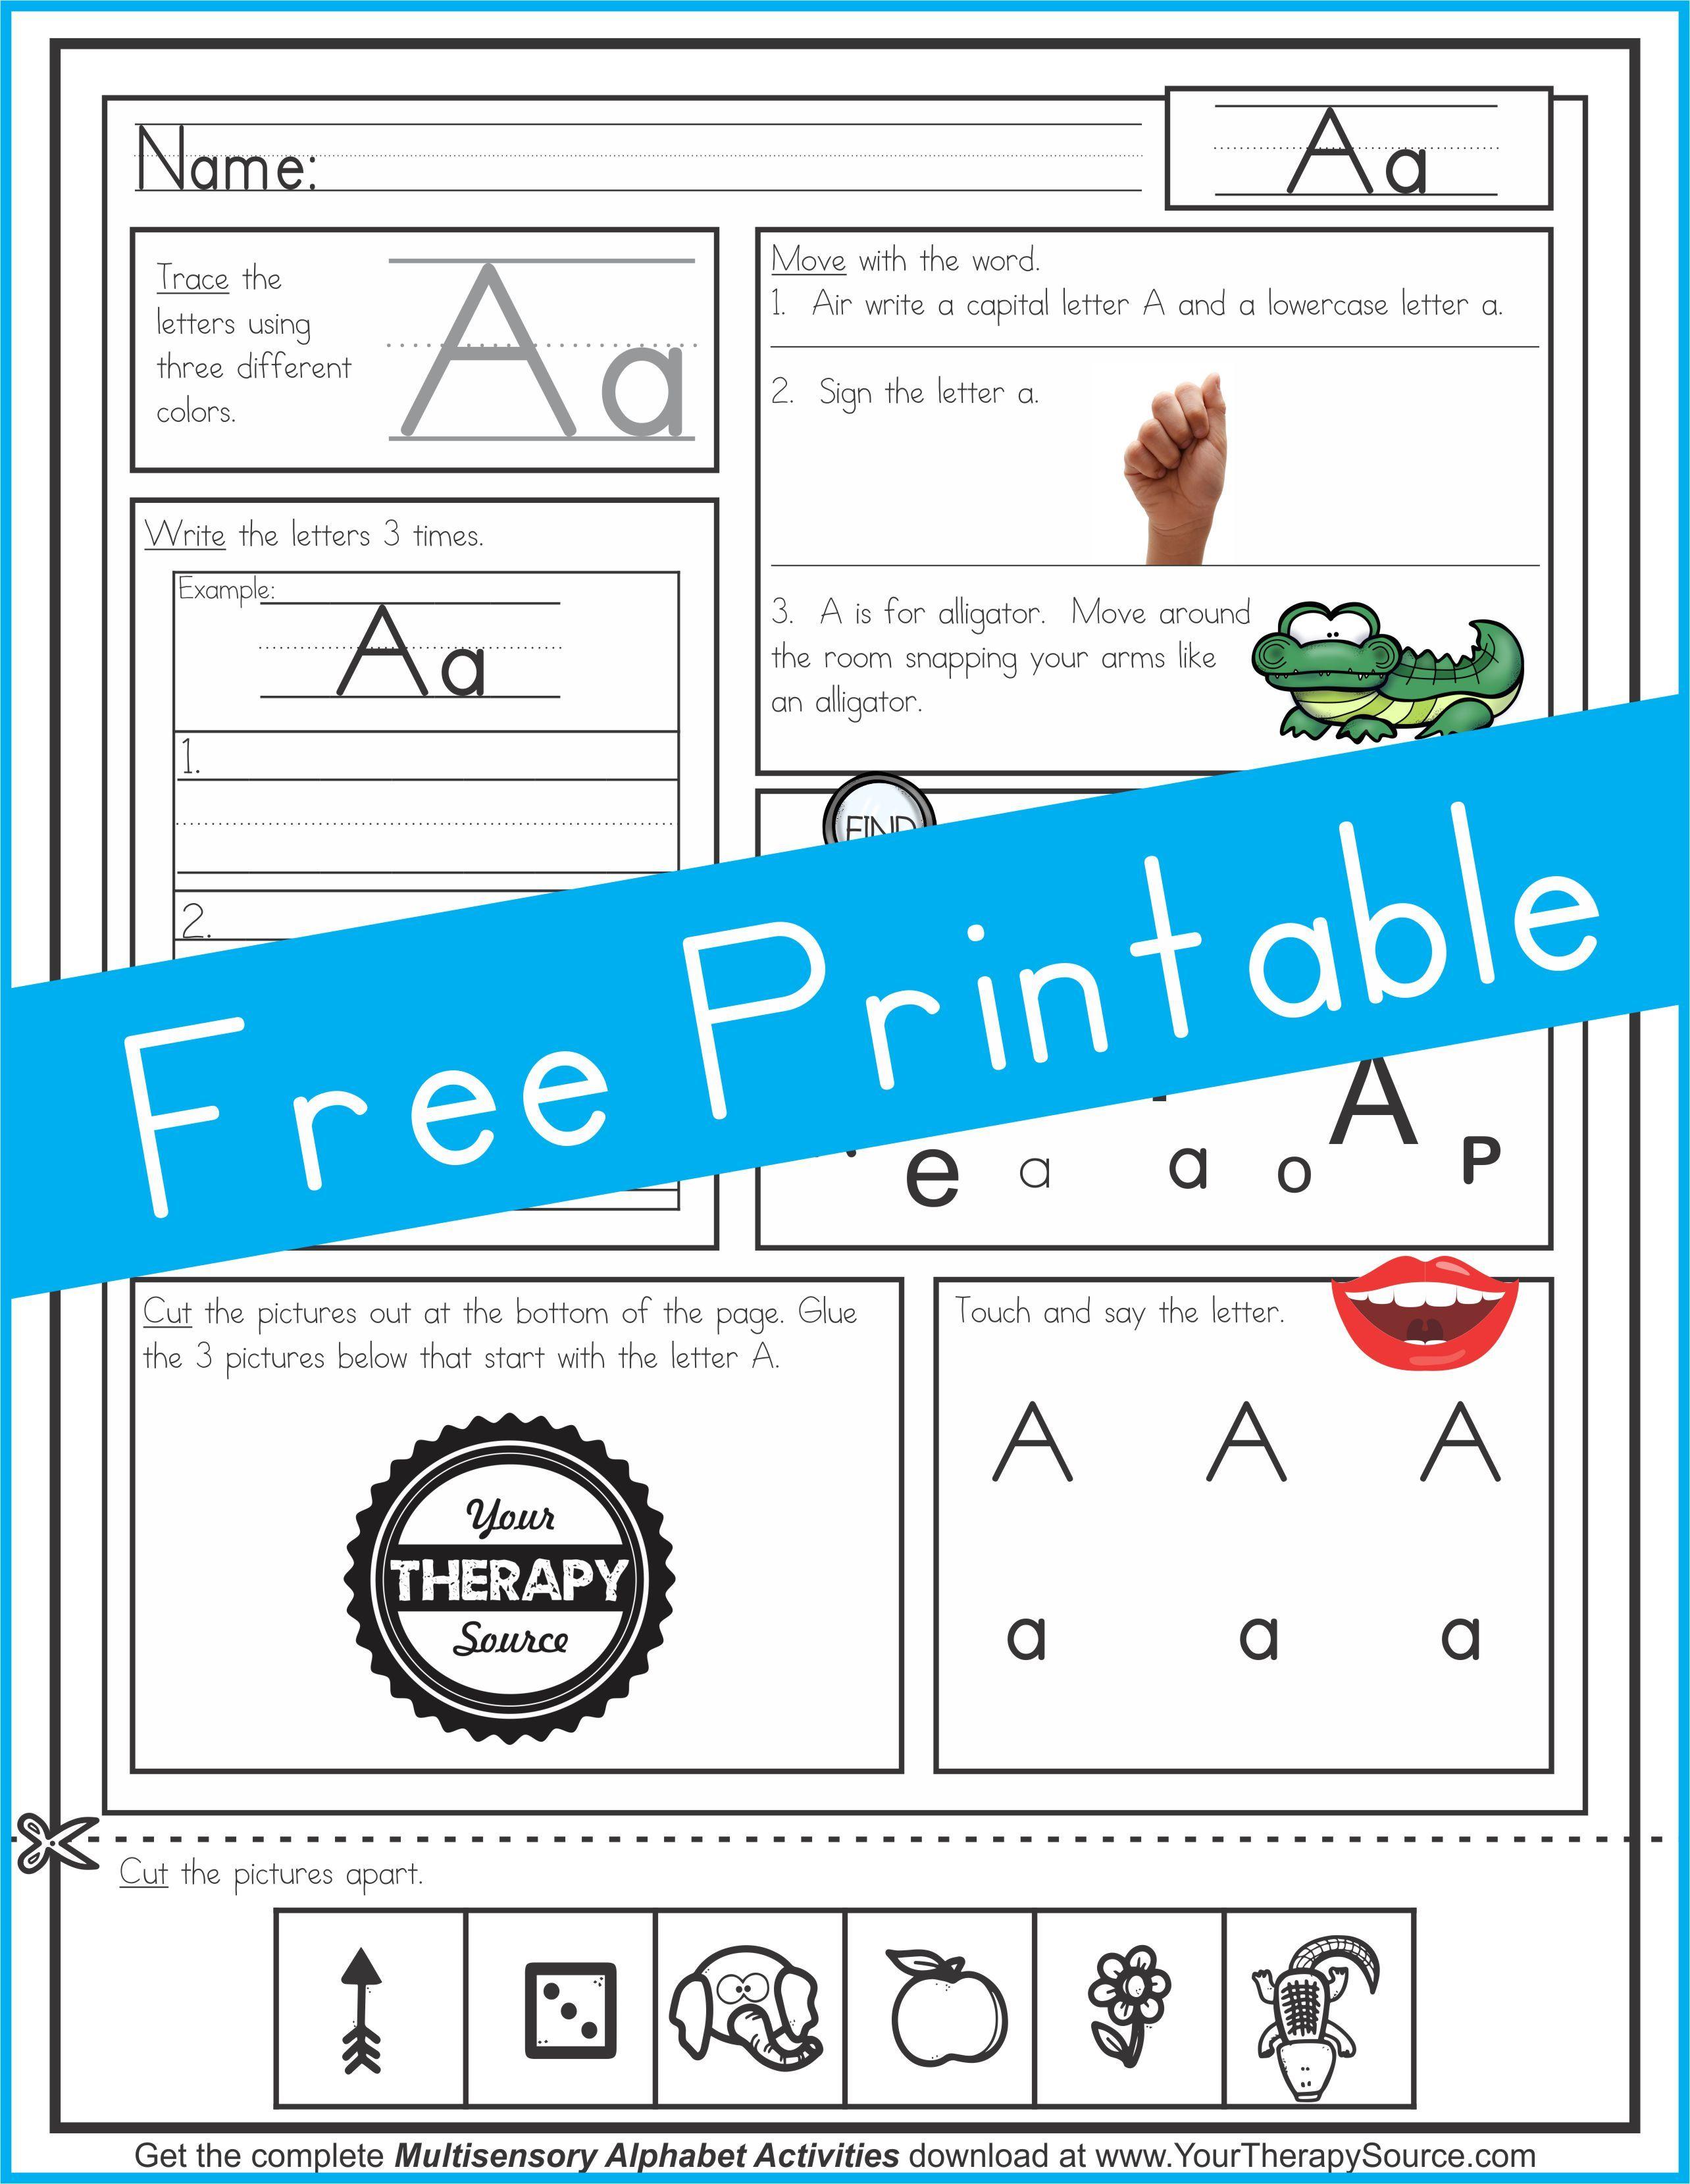 Multisensory Alphabet Freebie